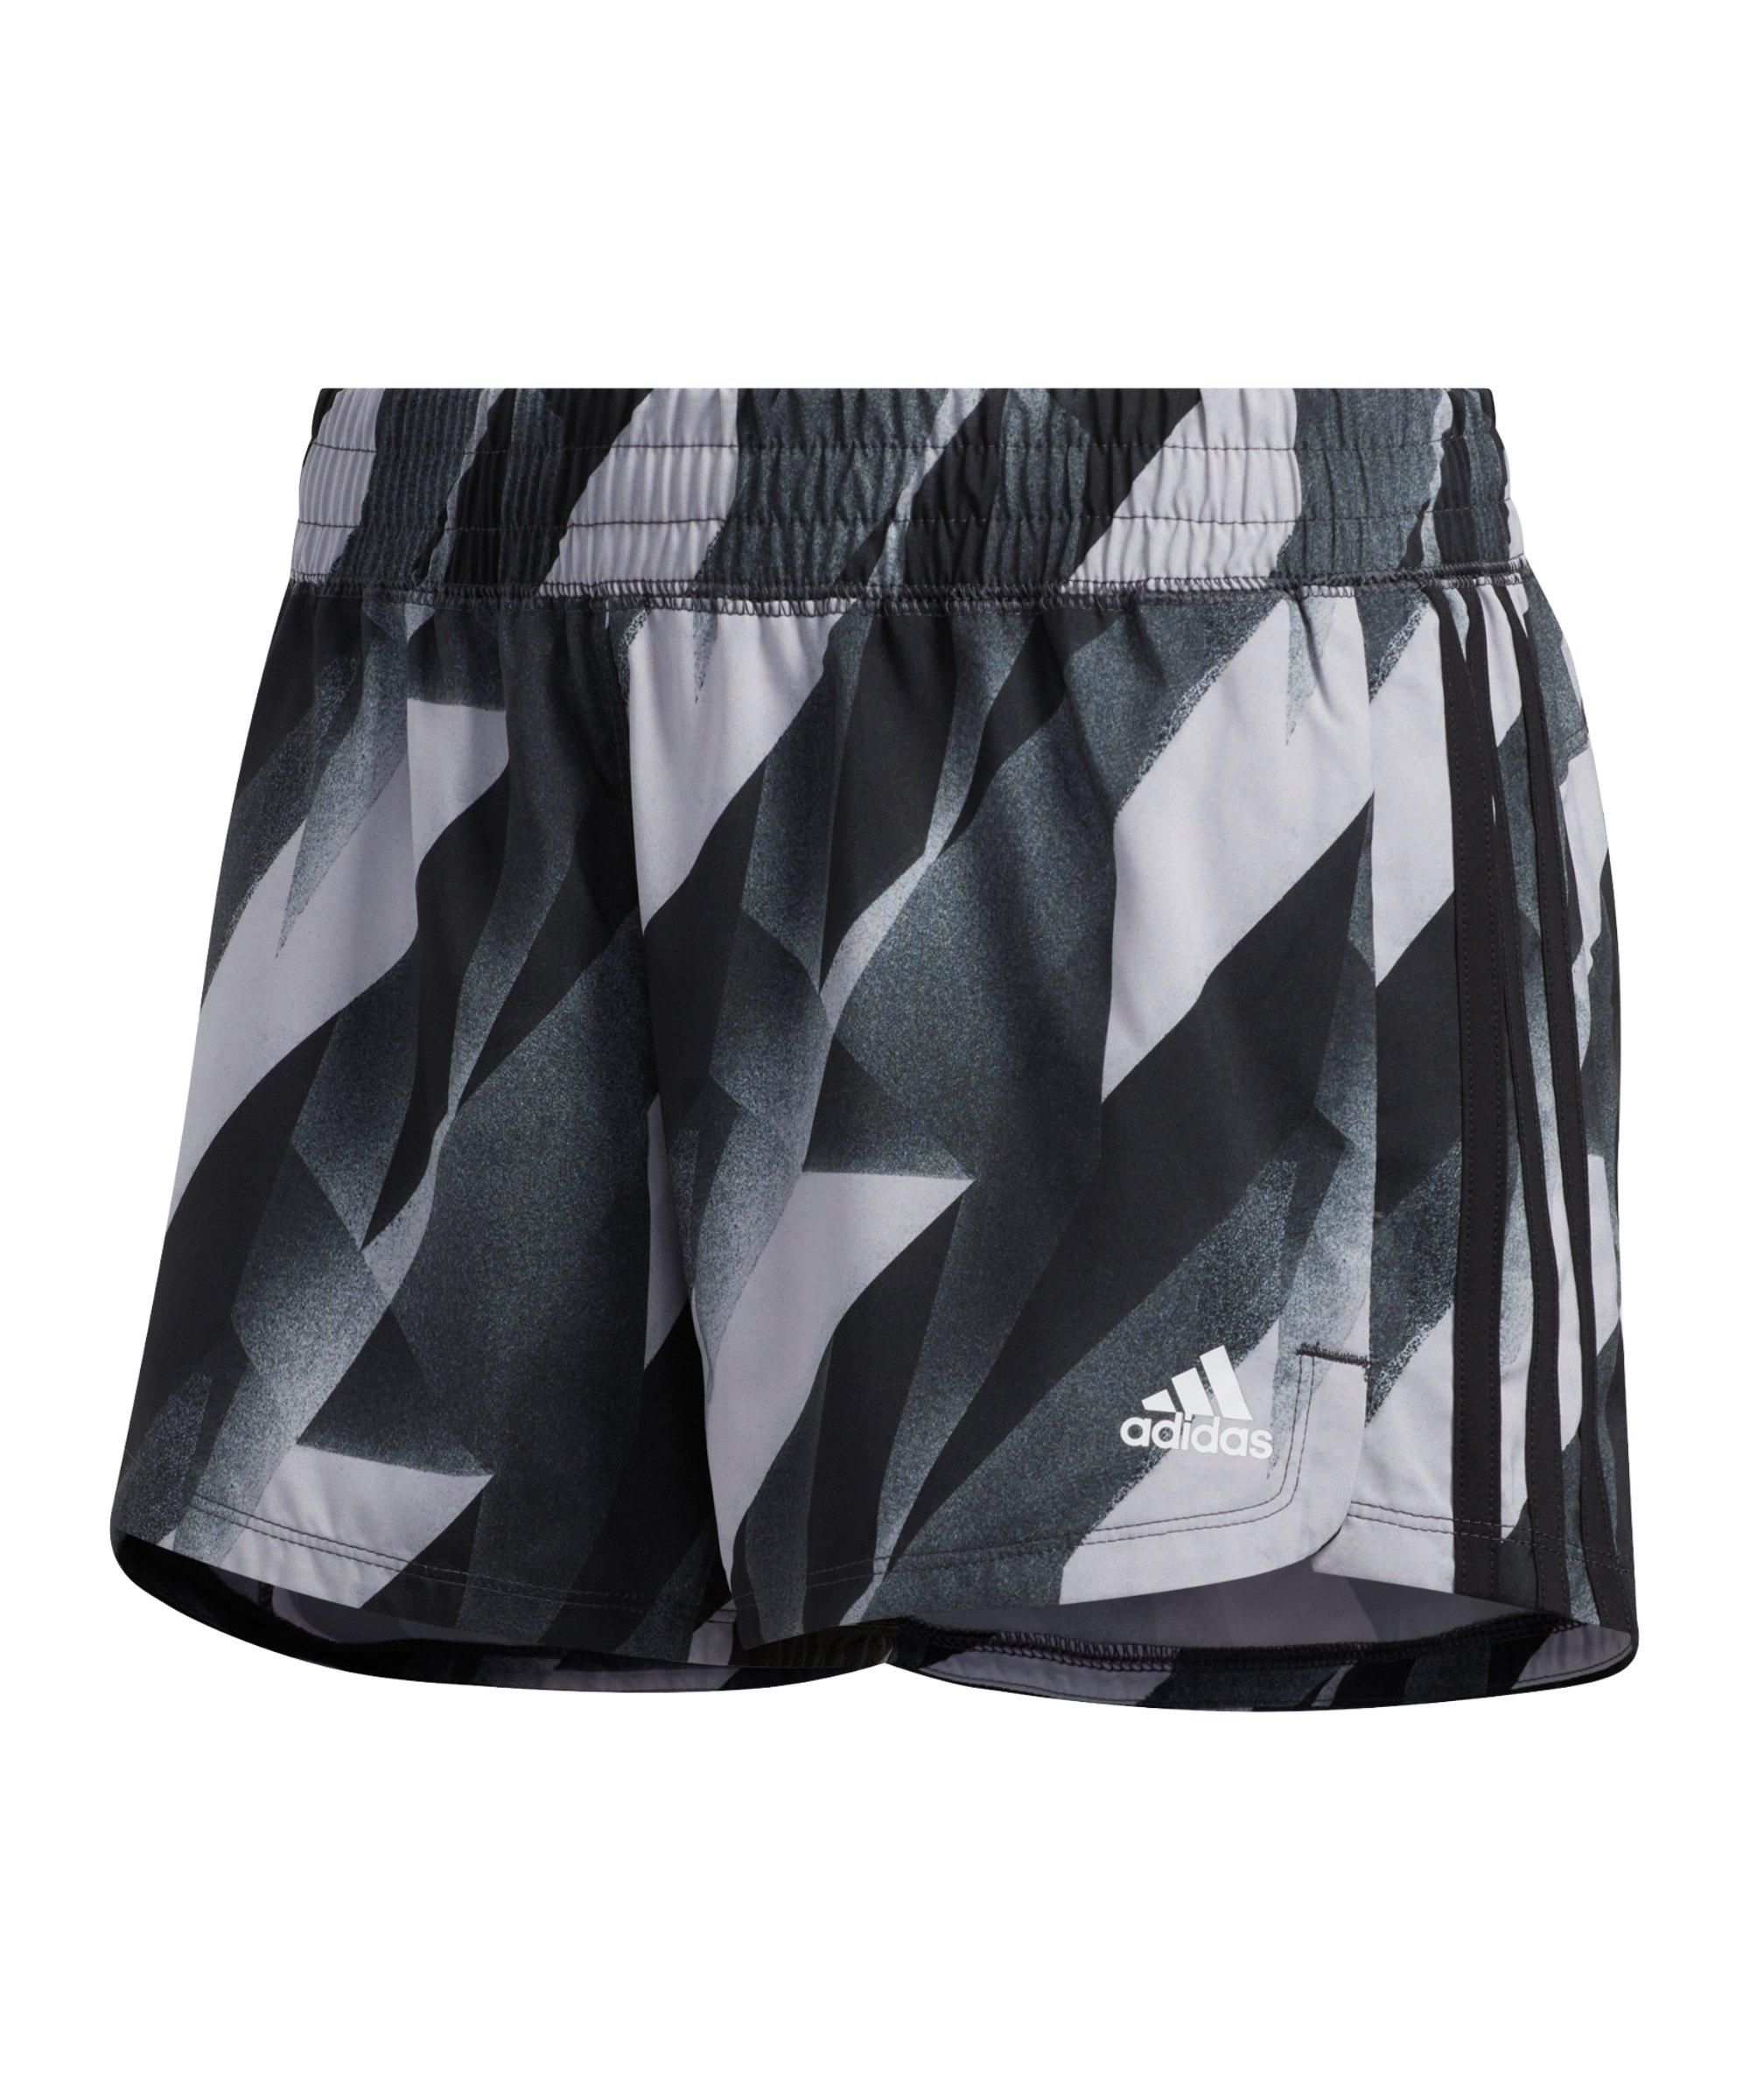 adidas Pacer HTC Short Running Damen Grau Schwarz - grau